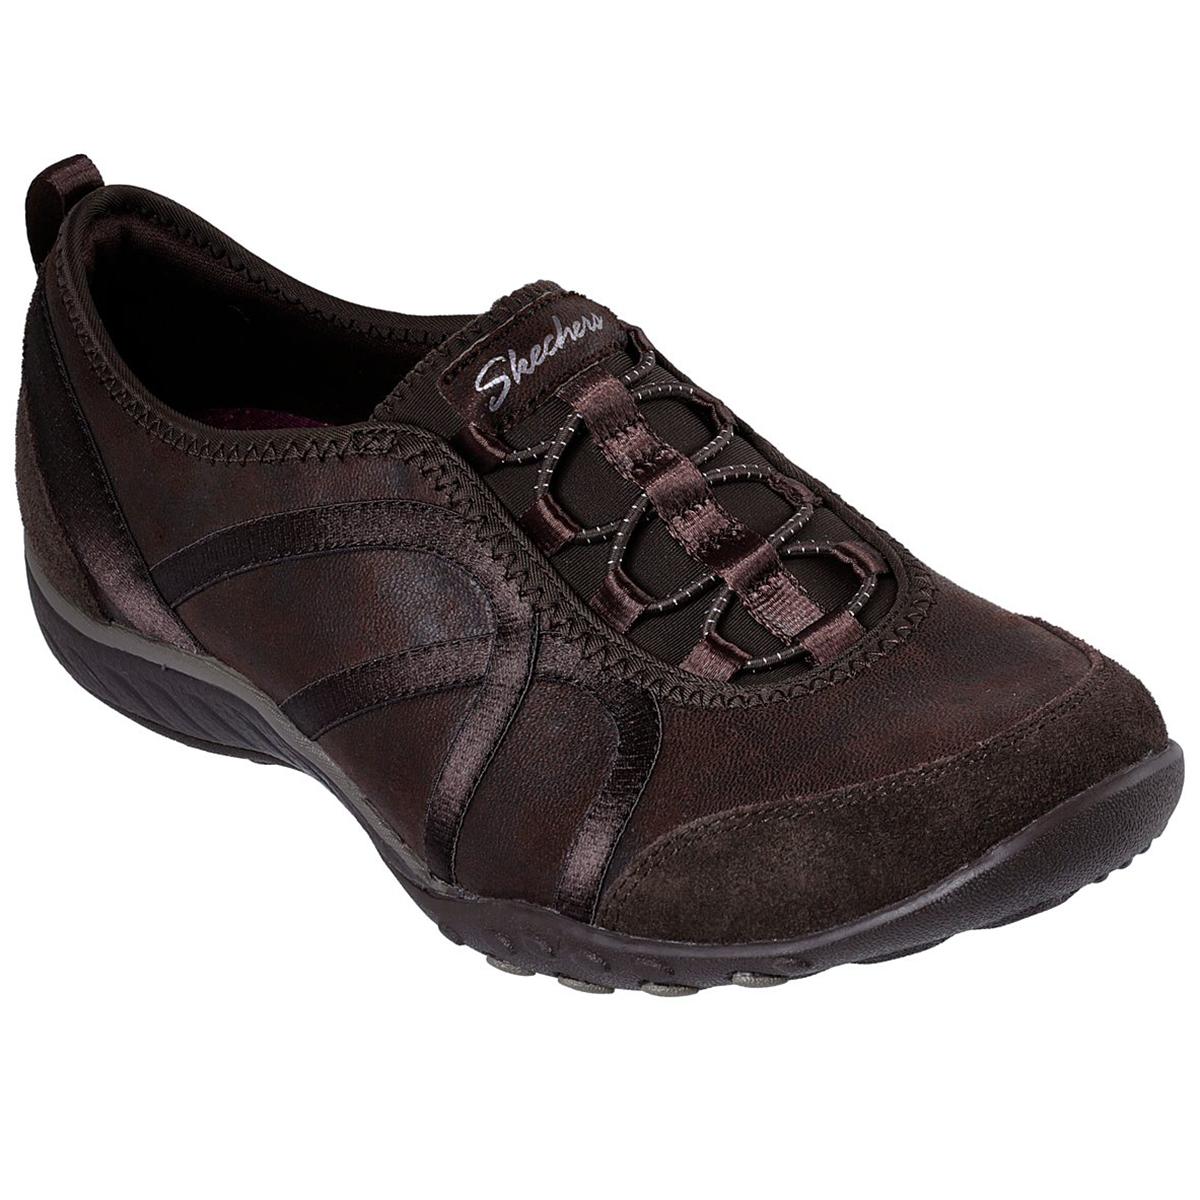 Skechers Women's Relaxed Fit: Breathe Easy - Flawless Look Sneakers - Brown, 8